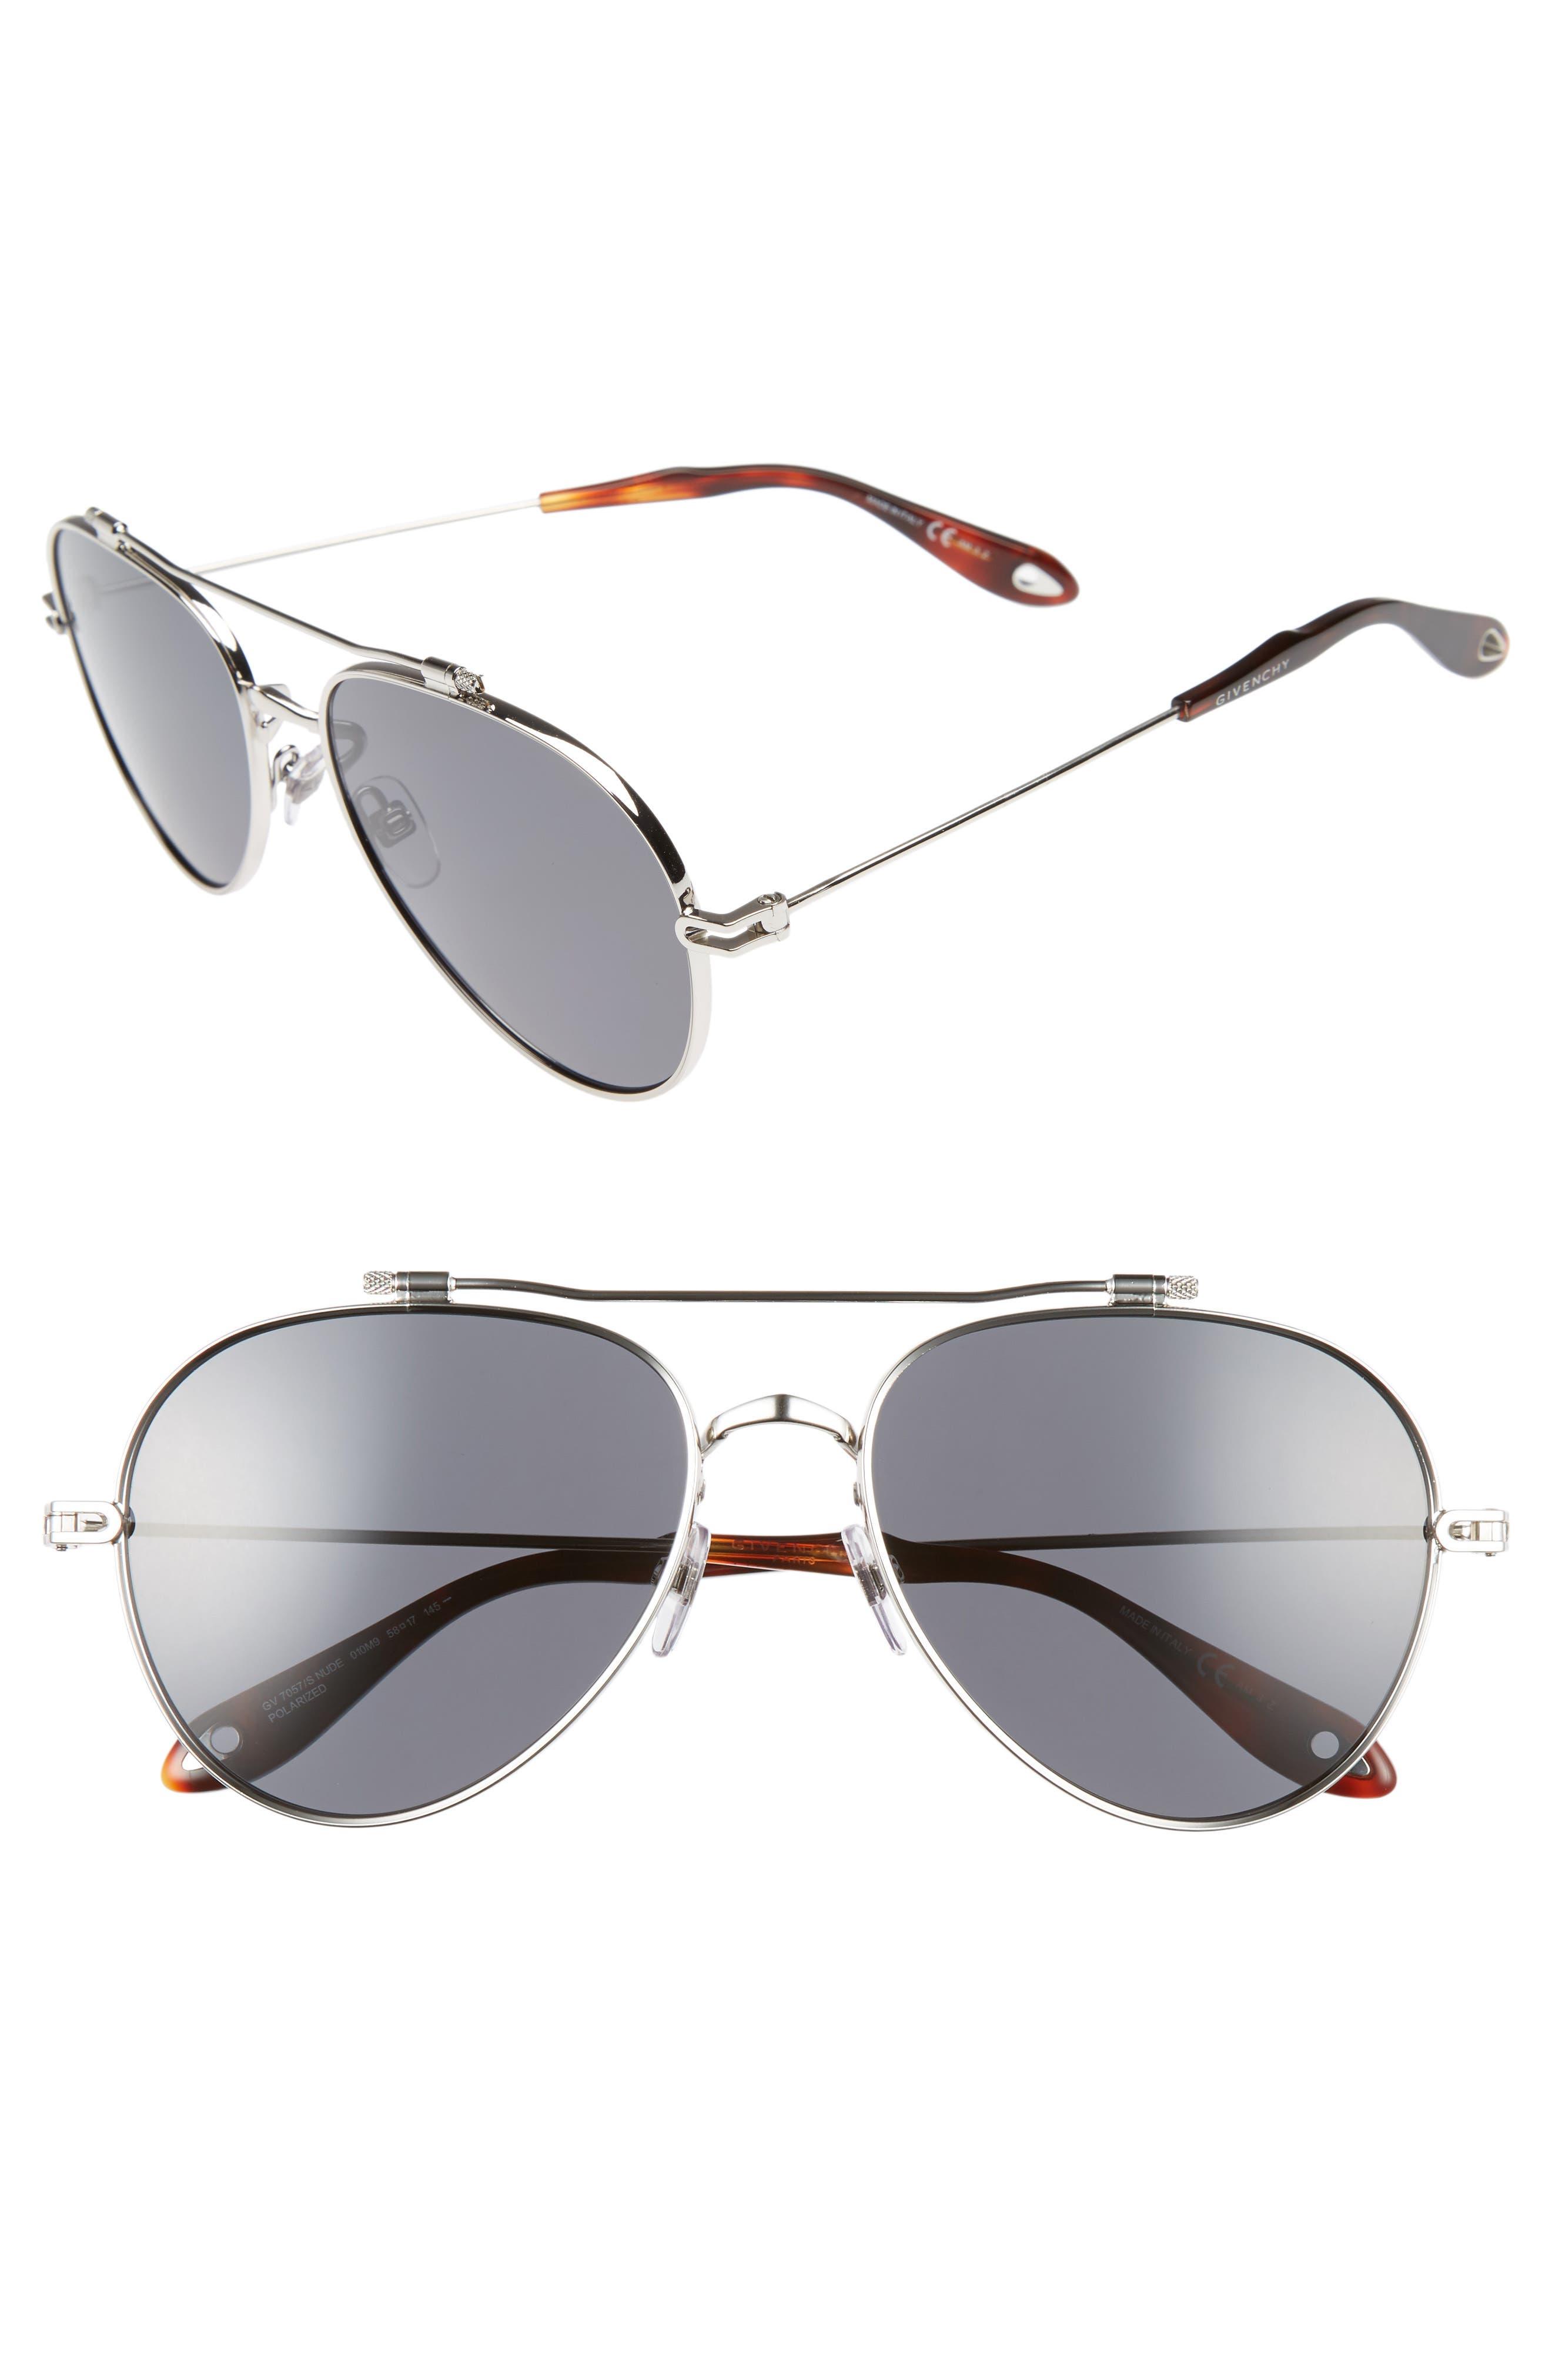 58mm Polarized Aviator Sunglasses,                             Main thumbnail 1, color,                             PALLADIUM